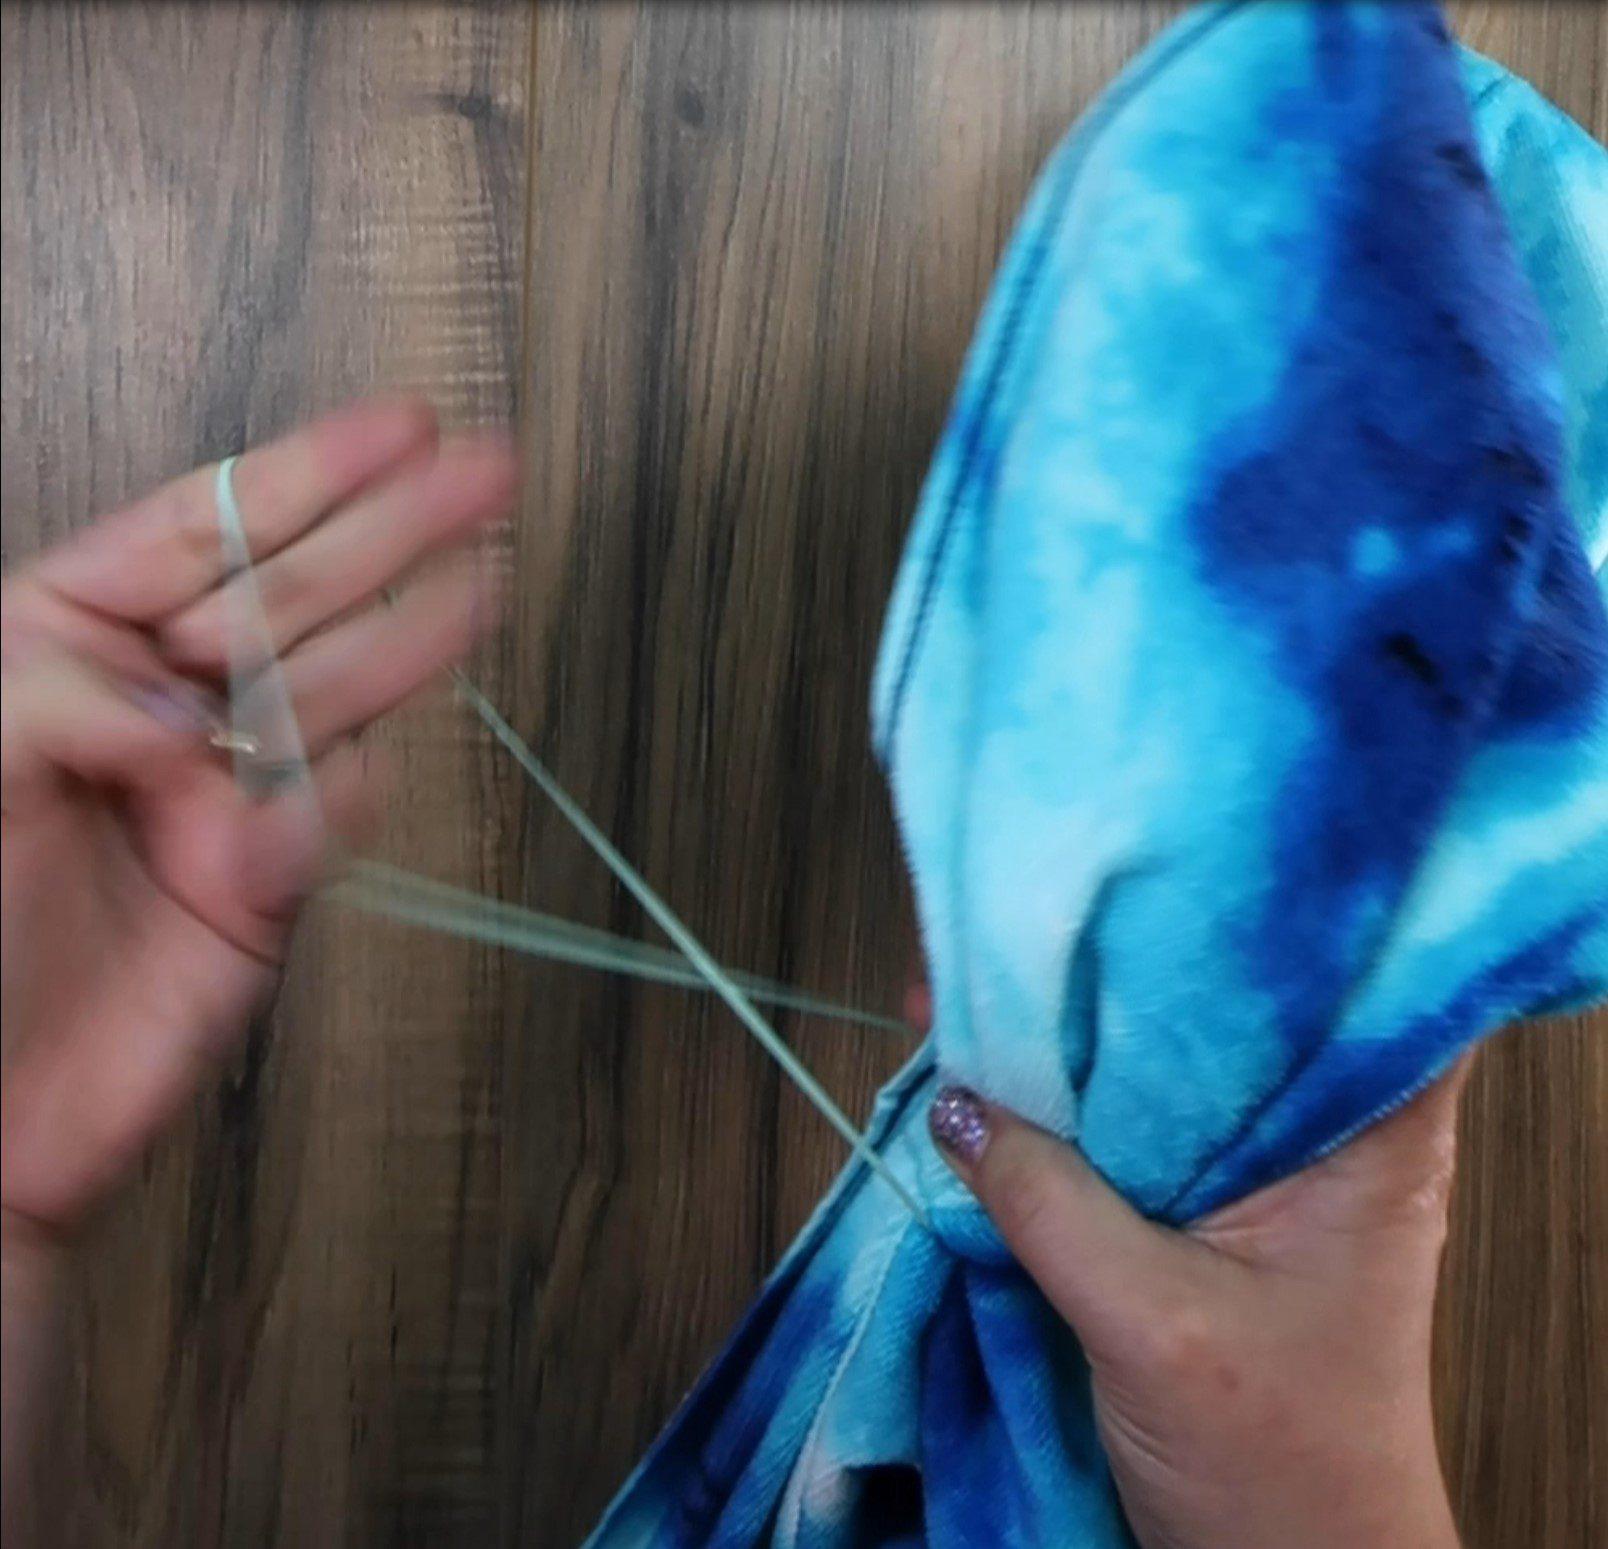 How to make a mermaid towel step 1b